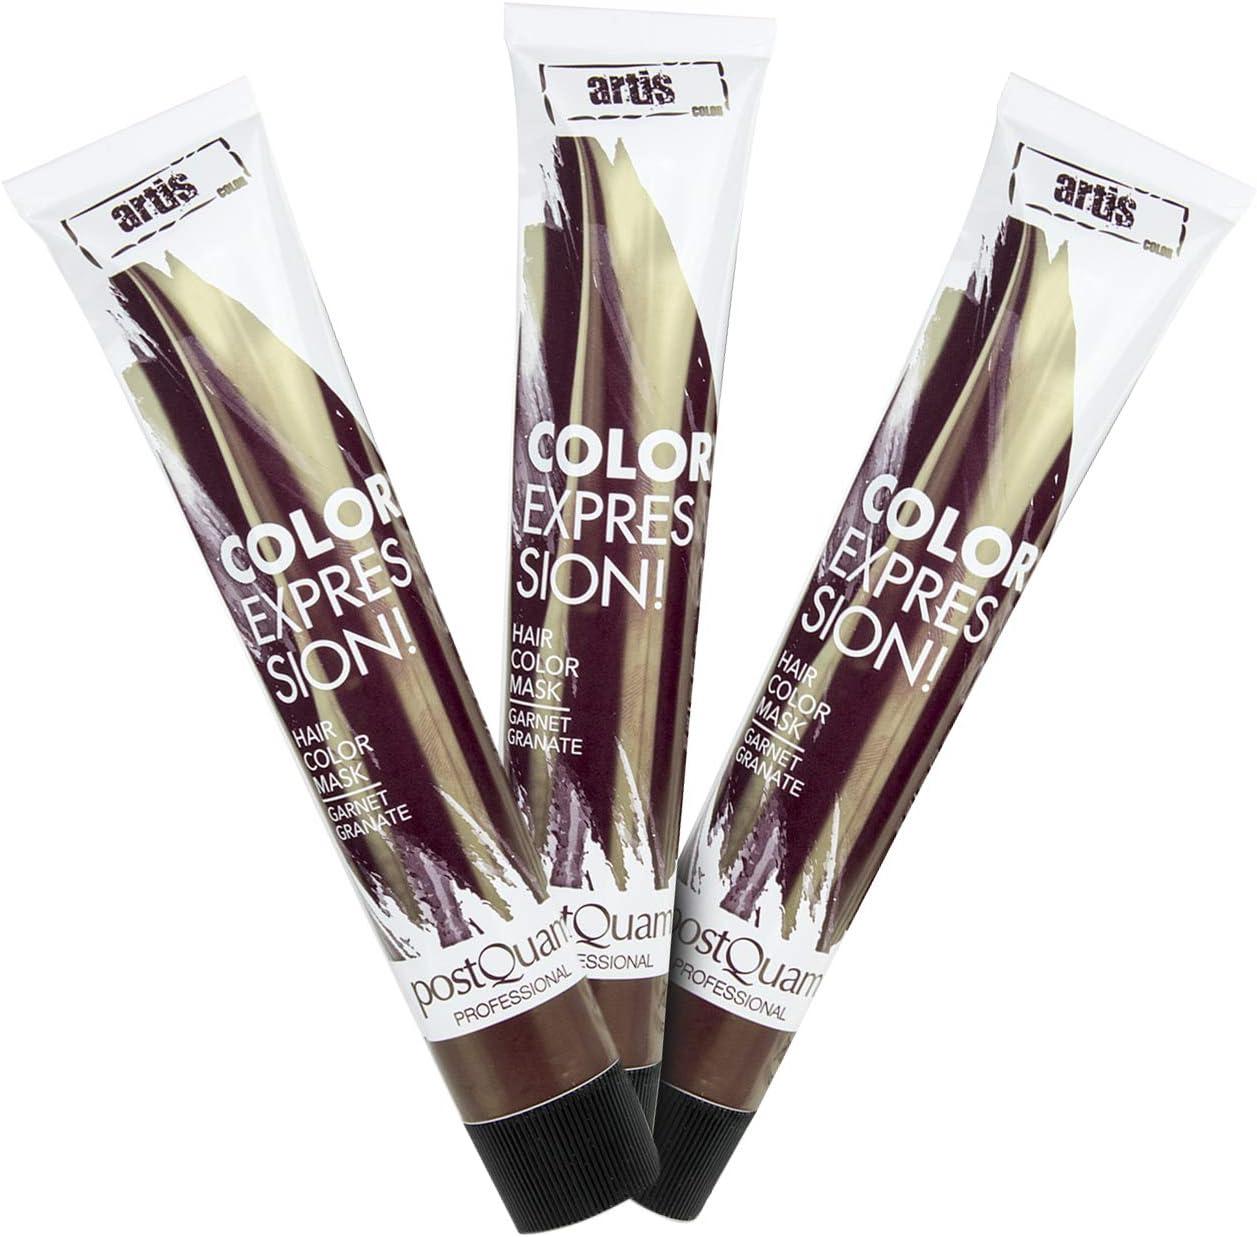 PostQuam - Mascarilla Color Expression, Tinte temporal de pelo - Color Granate - Pack de 3 unidades - 60 gr